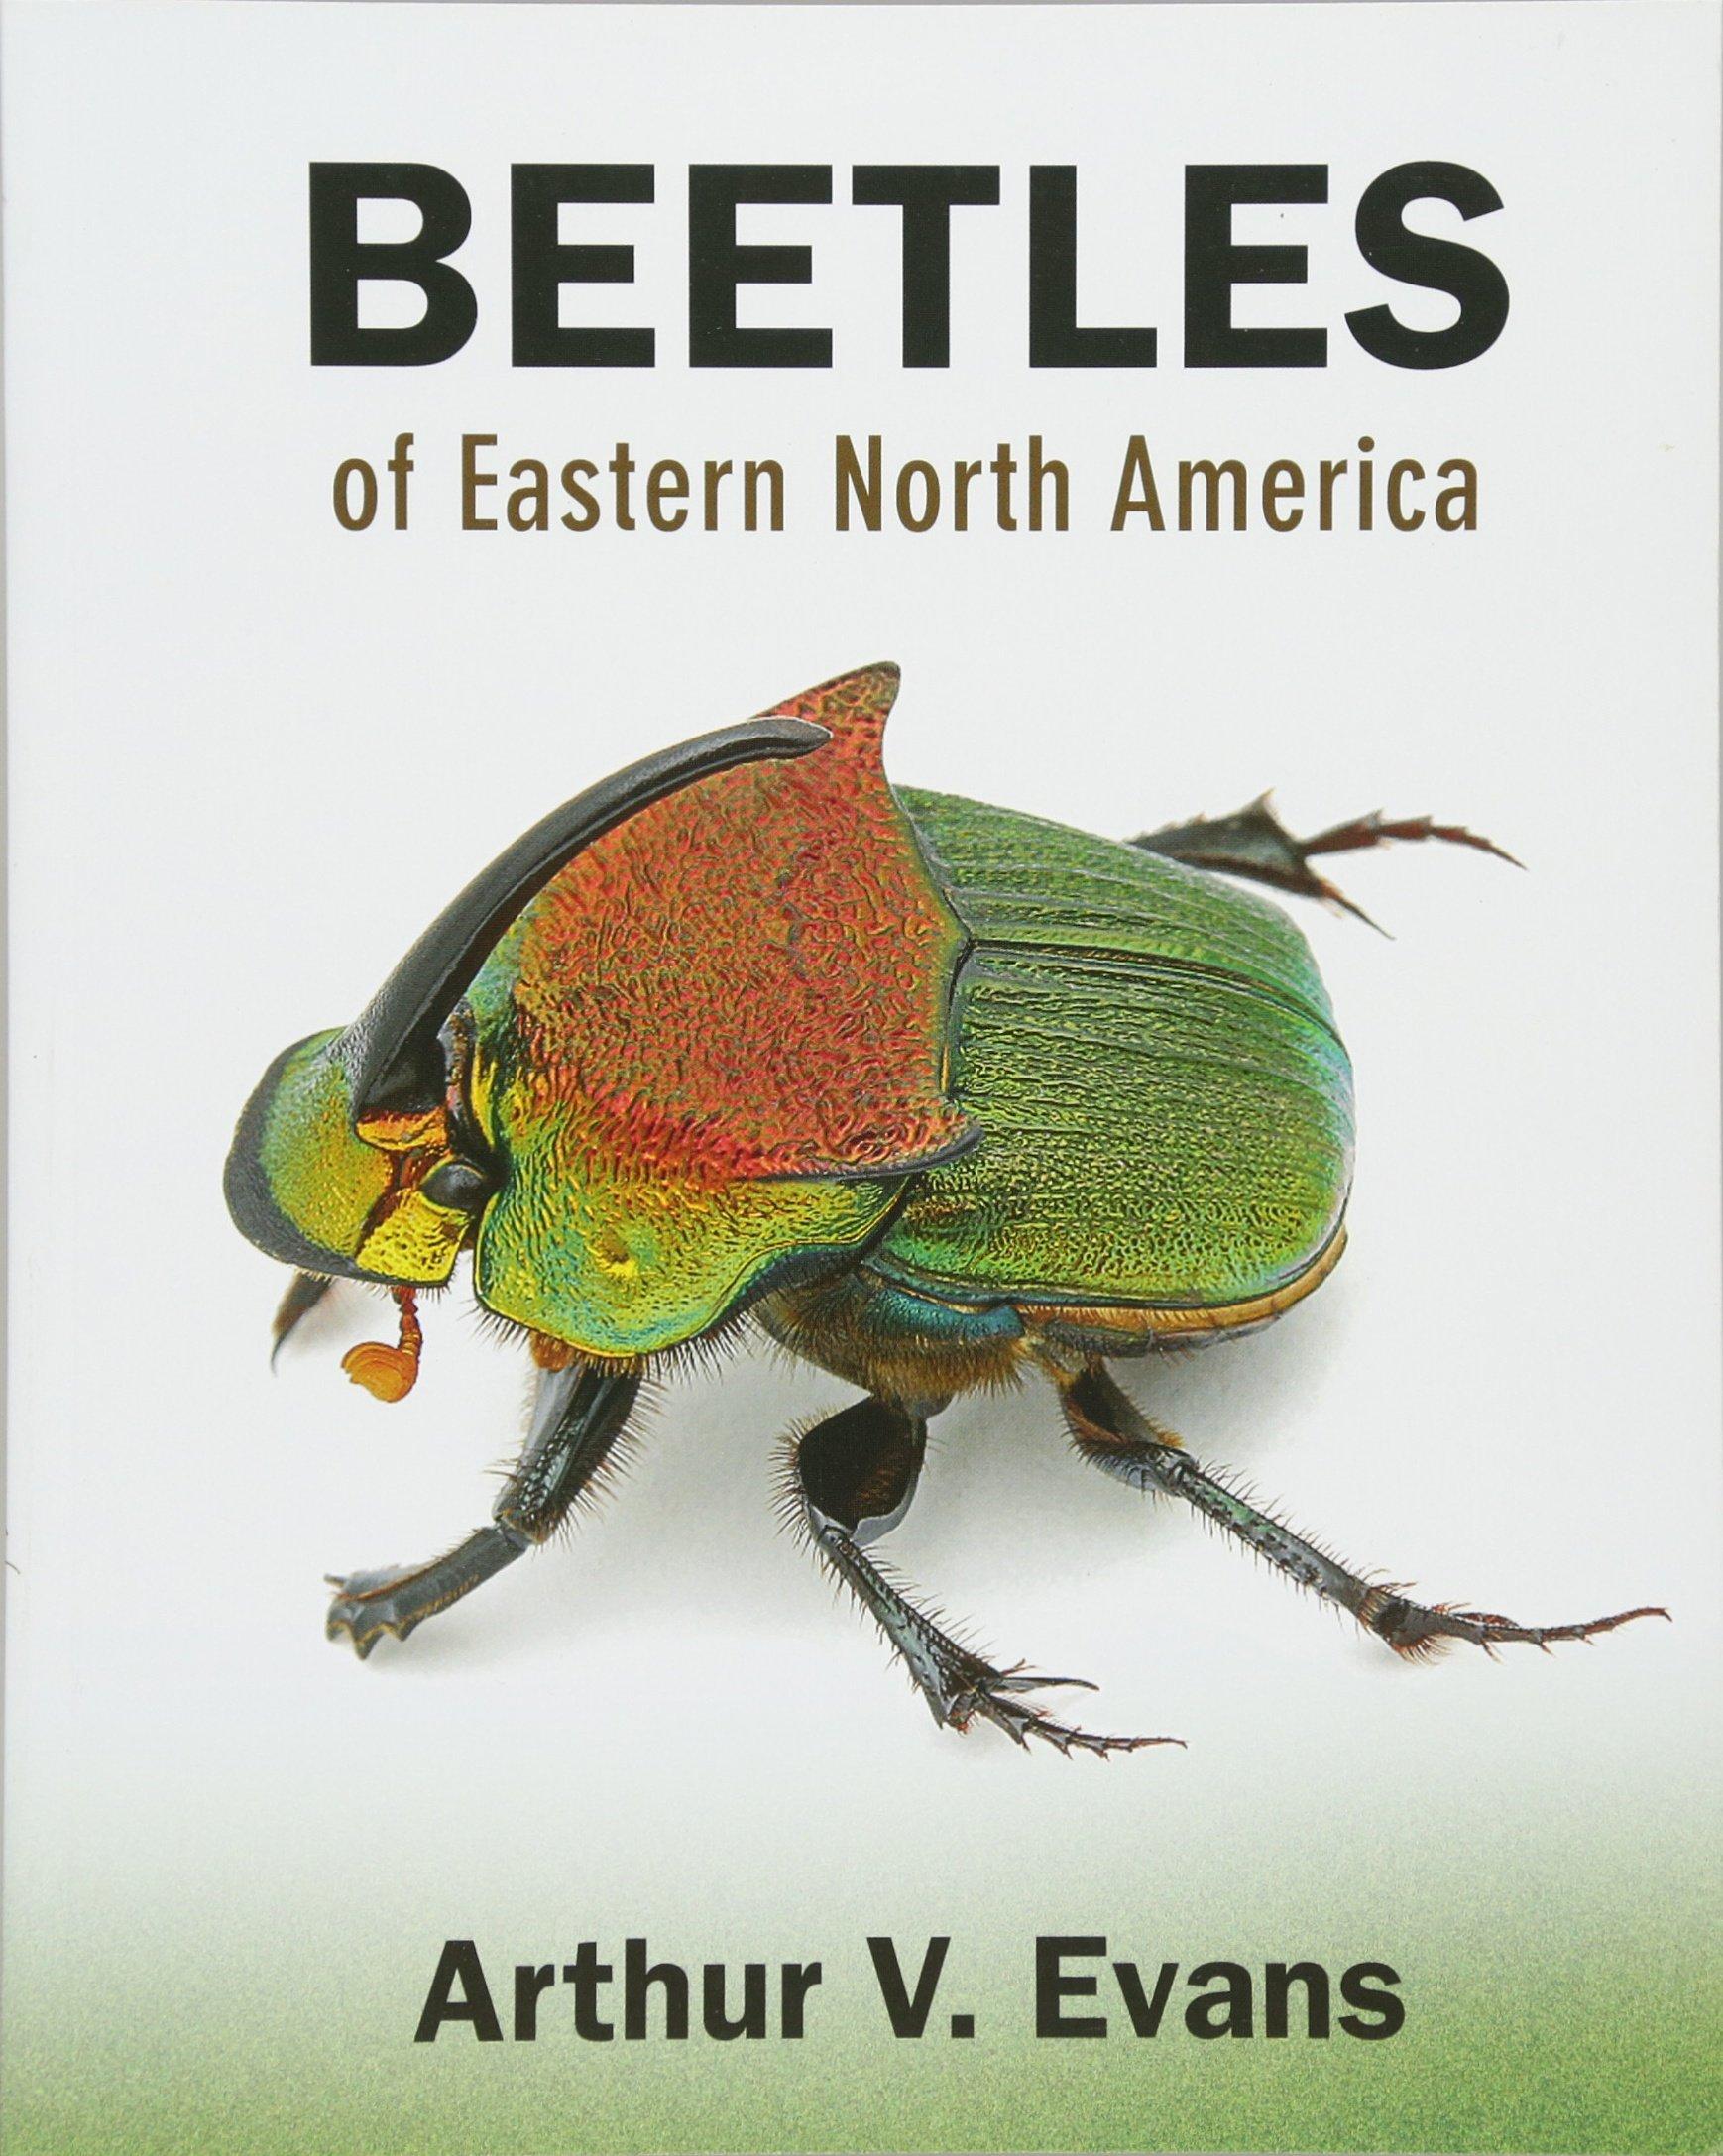 Beetles of Eastern North America: Arthur V. Evans: 9780691133041 ...